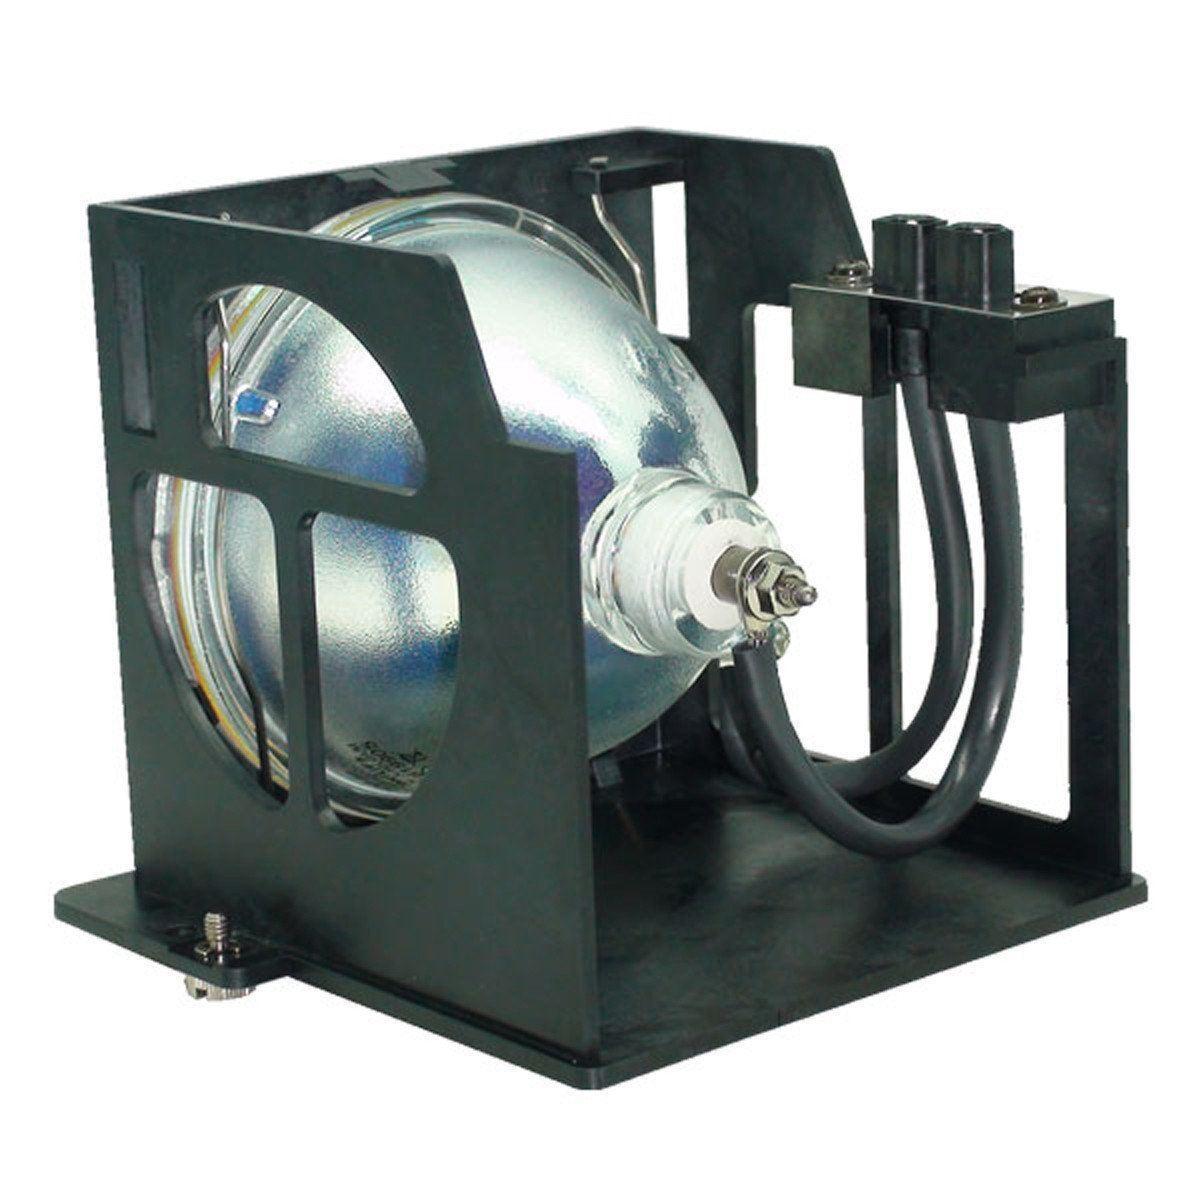 Gemstar GDT-56DRP Philips TV Lamp Module image 4